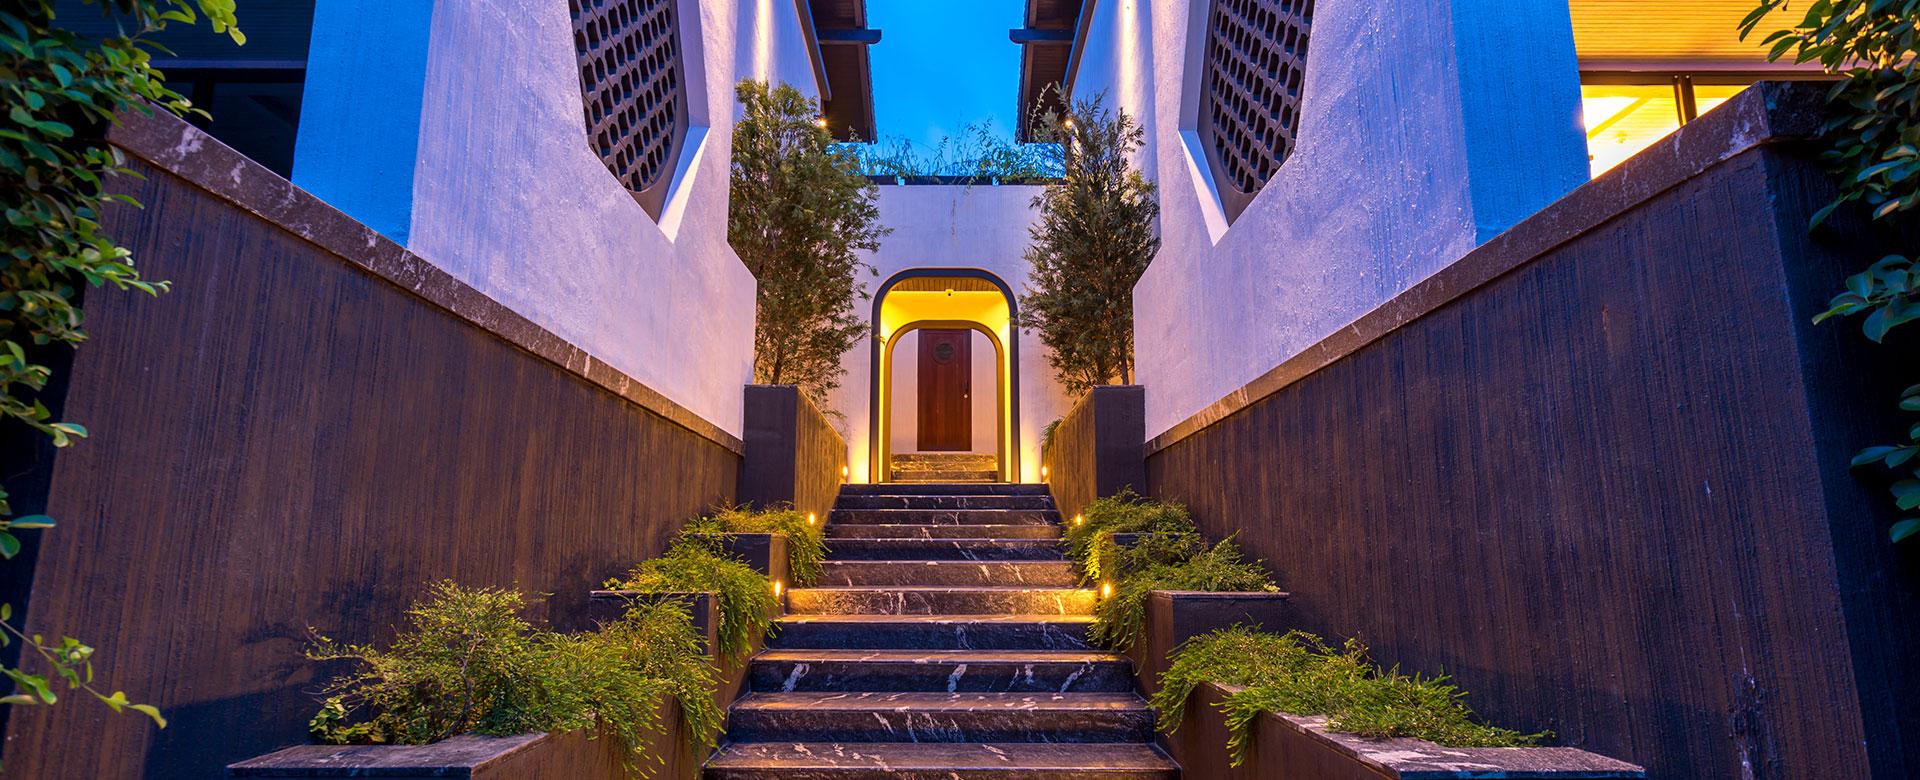 17-Facilities-Baba-Beach-Club-Luxury-Hotel-Phuket-by-Sri-Panwa